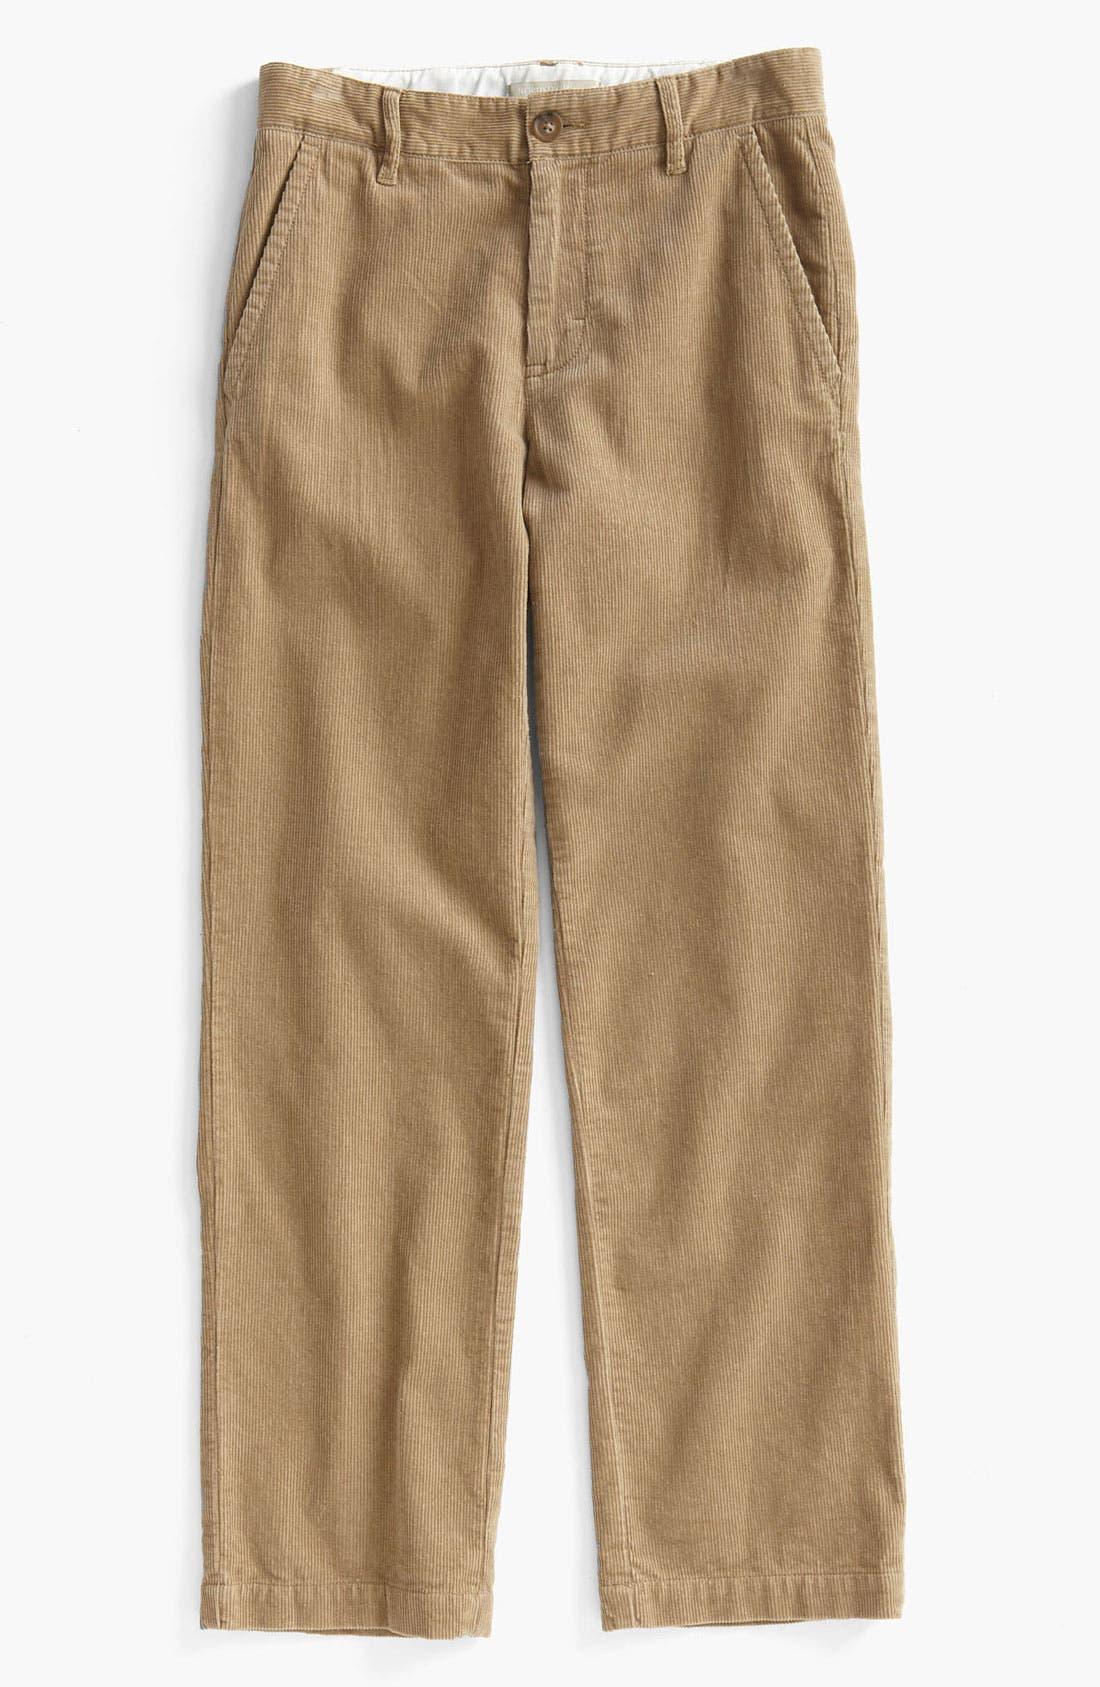 Alternate Image 1 Selected - Nordstrom 'Edward' Corduroy Trousers (Big Boys)